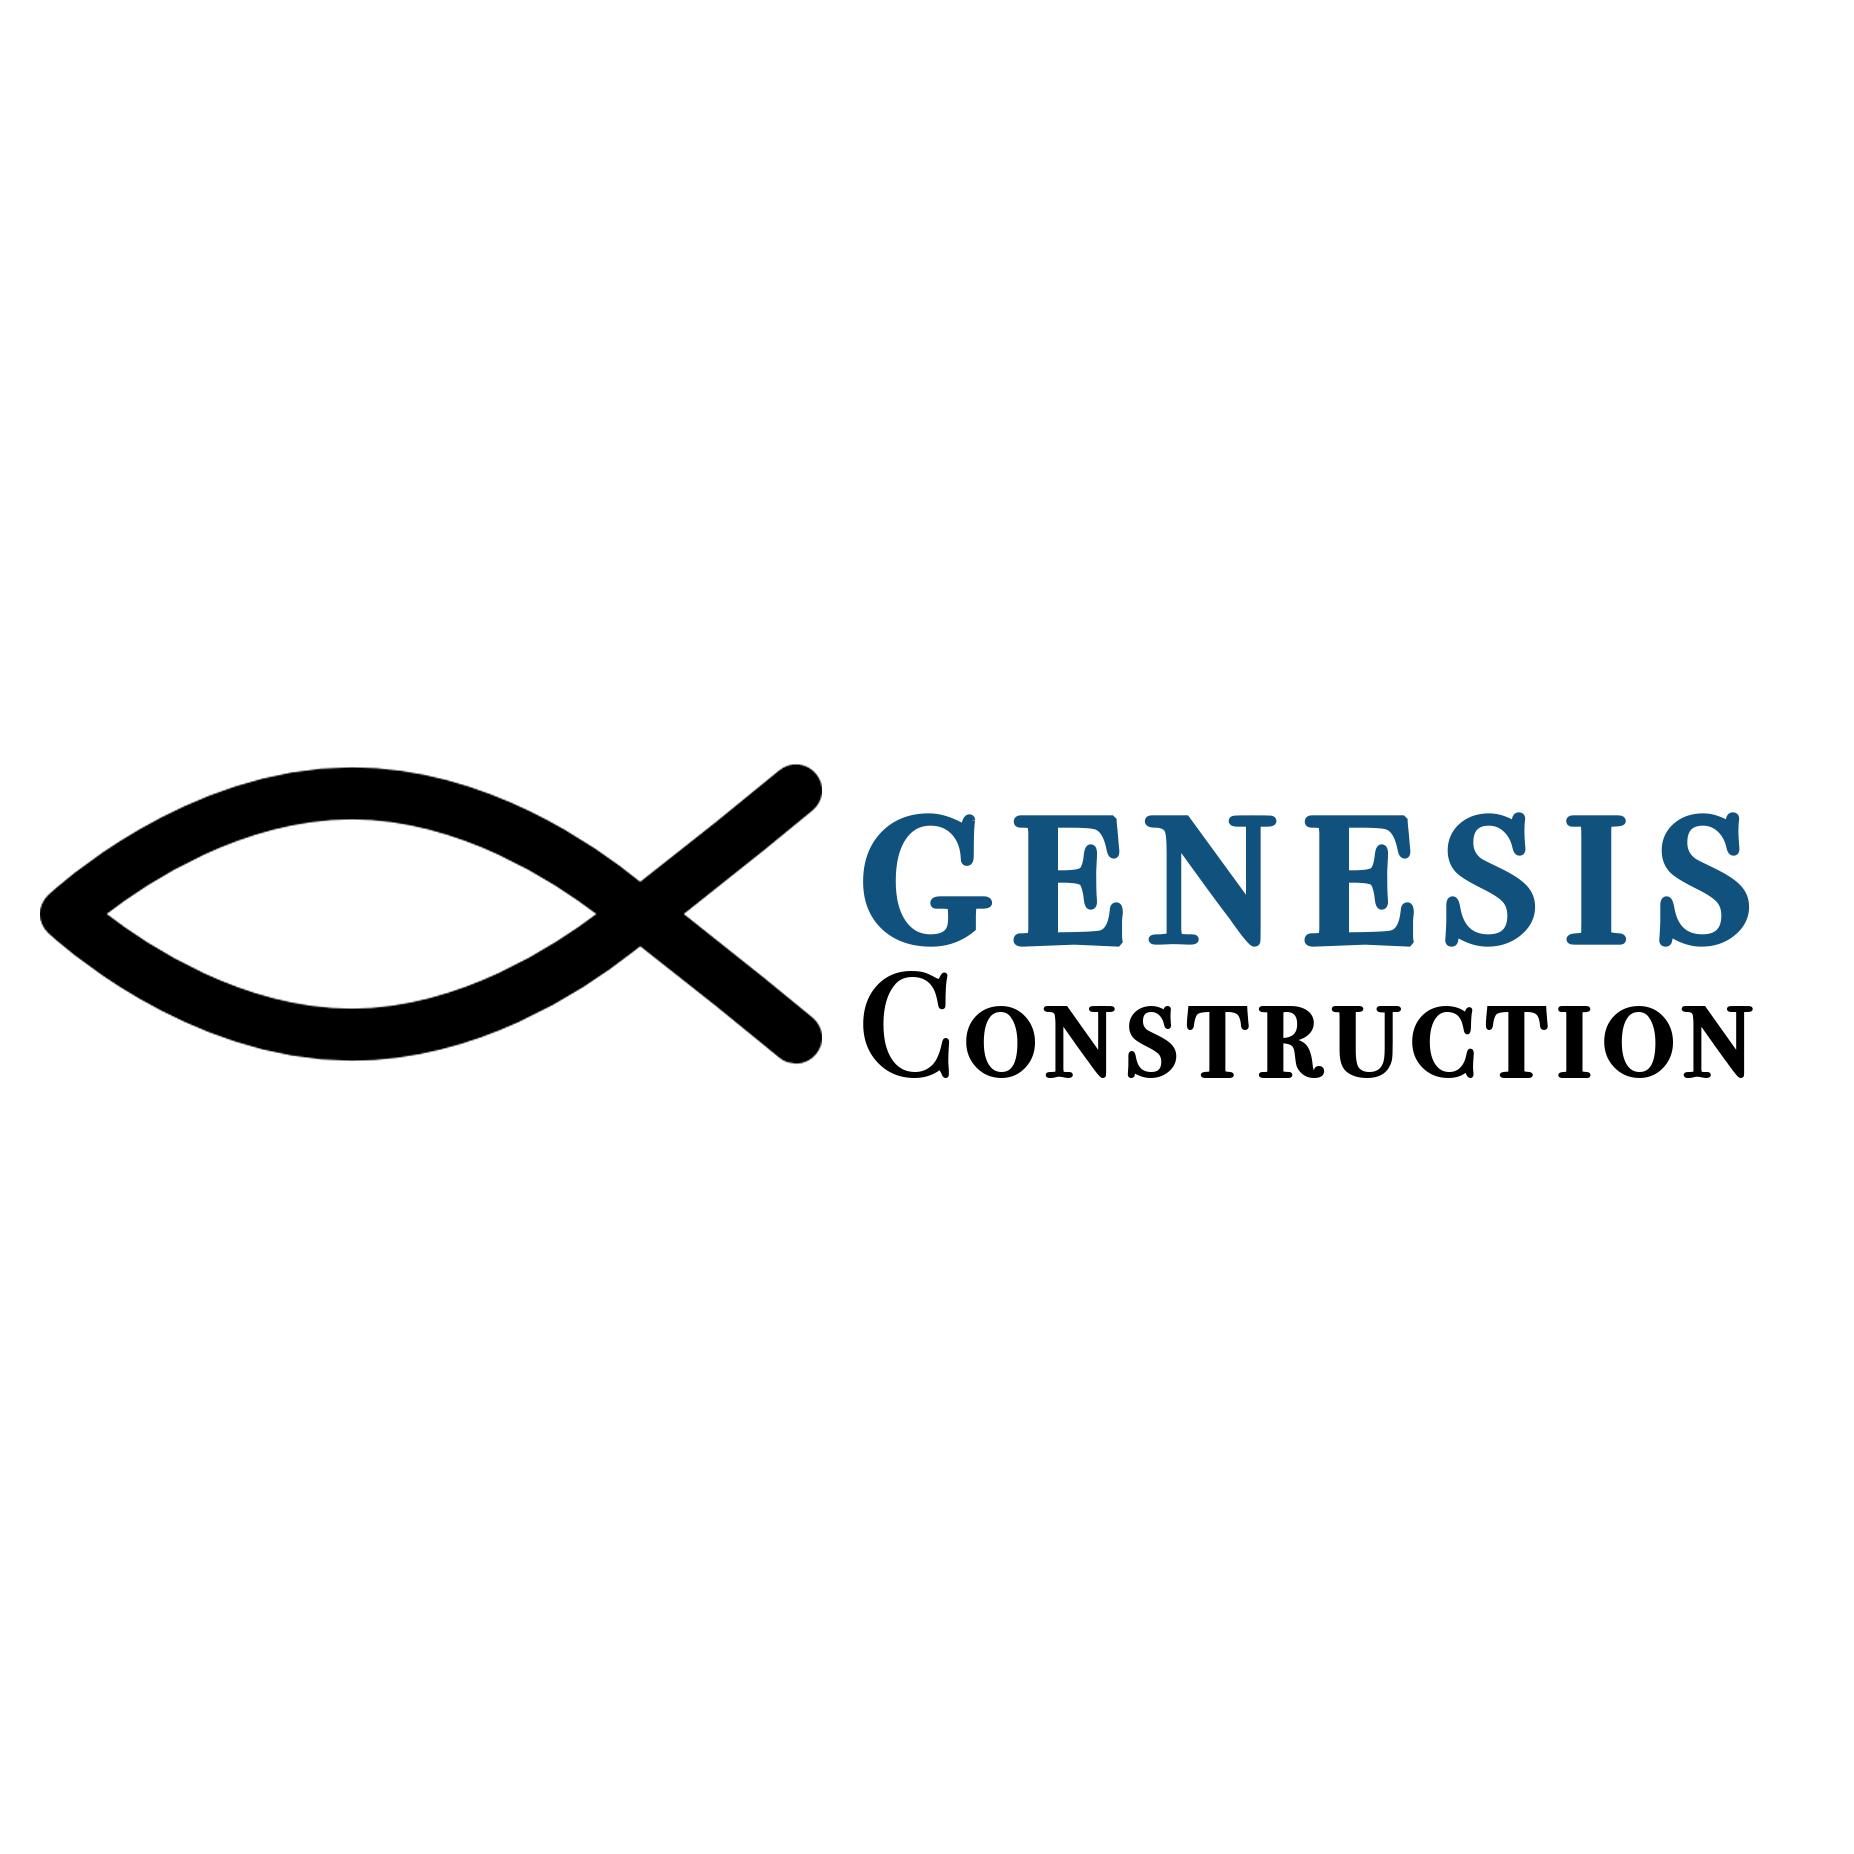 Genesis Construction image 5